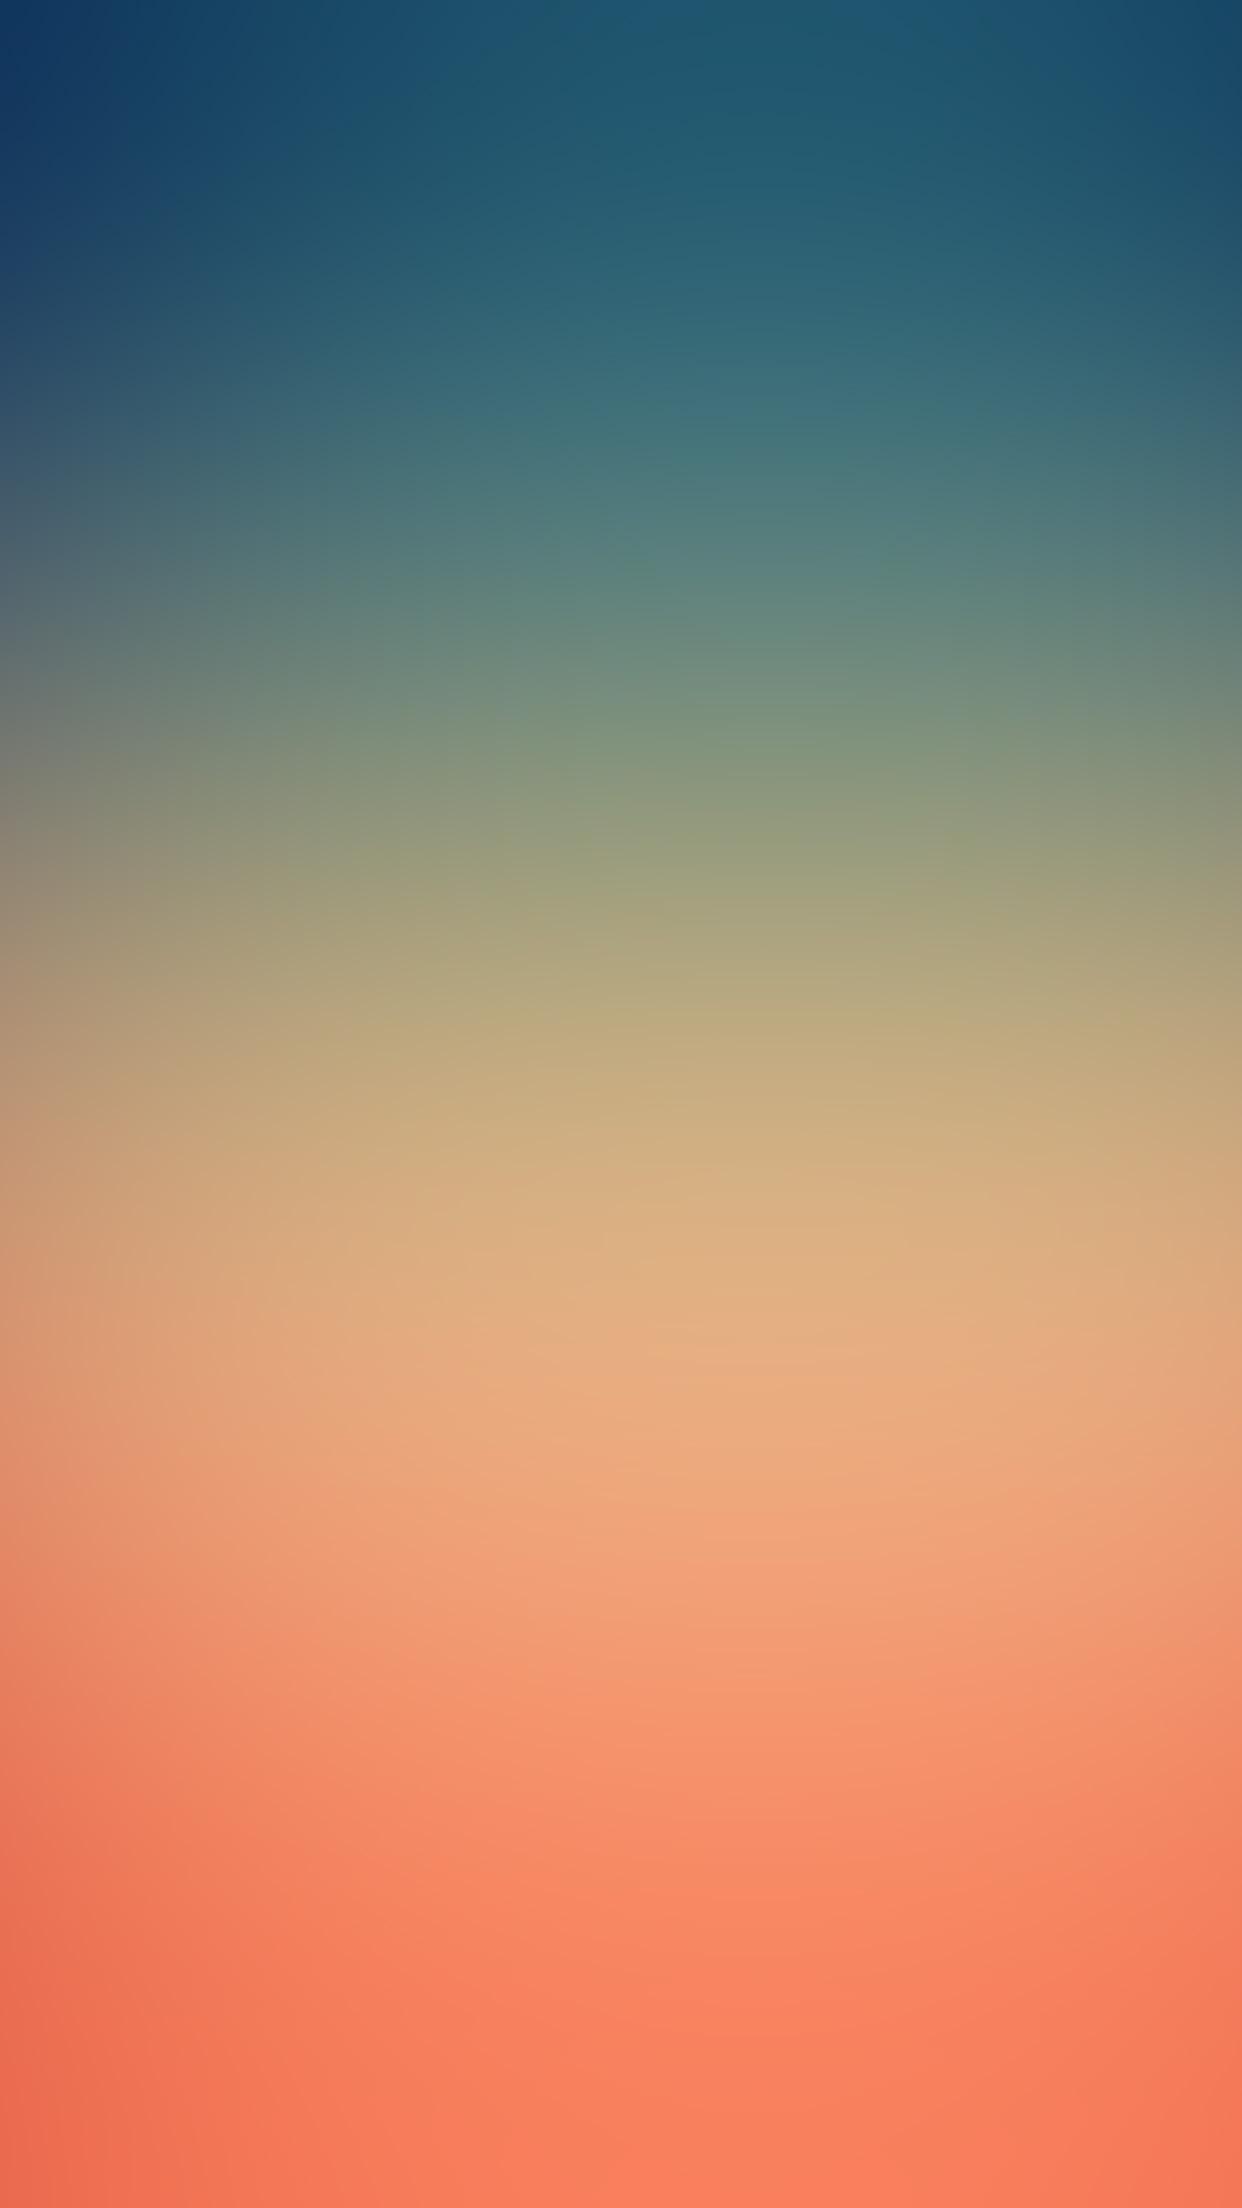 Iphonepapers Com Iphone 8 Wallpaper Sk83 Blue Orange